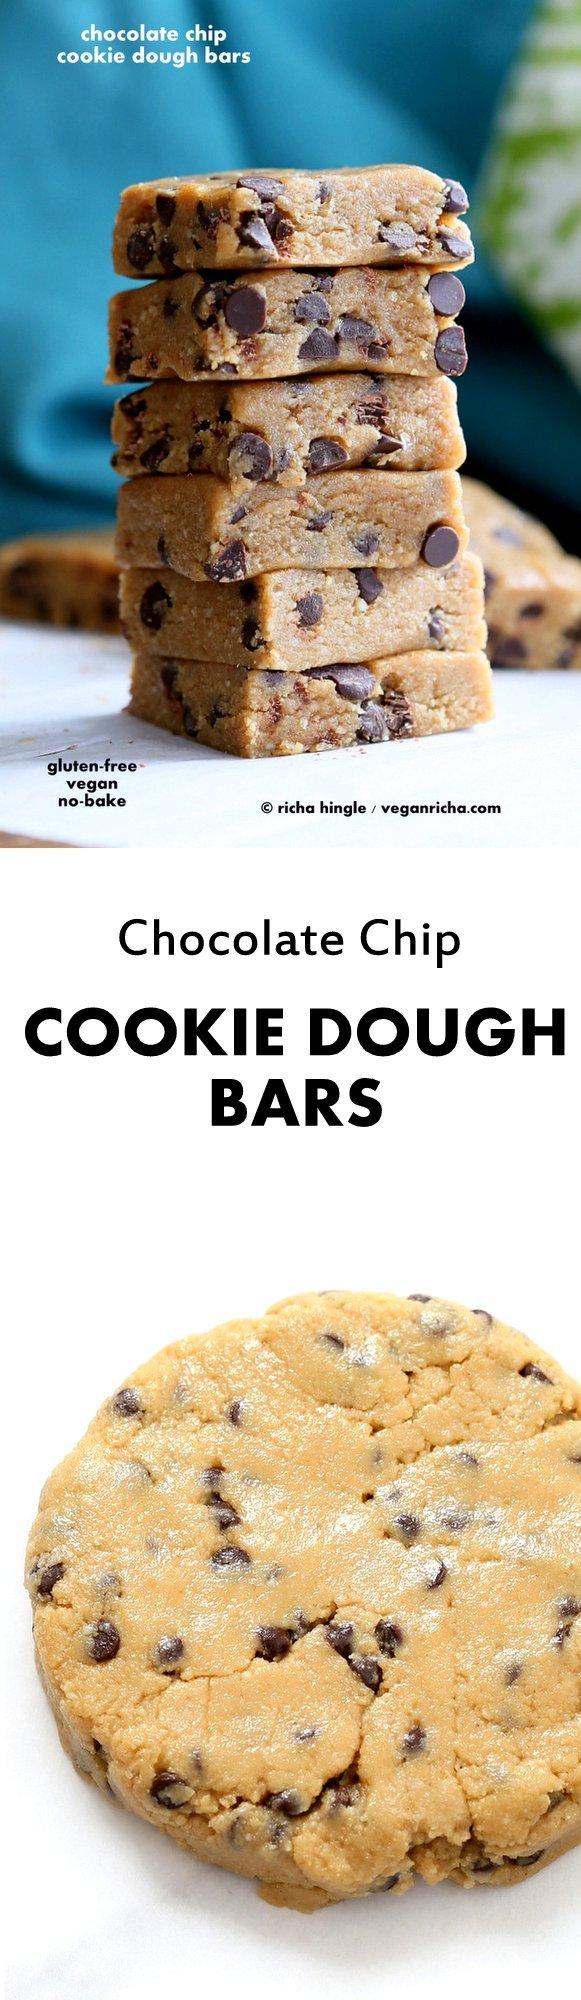 Easy Vegan Chocolate Chip Cookie Dough Bars. Gluten-free | VeganRicha.com